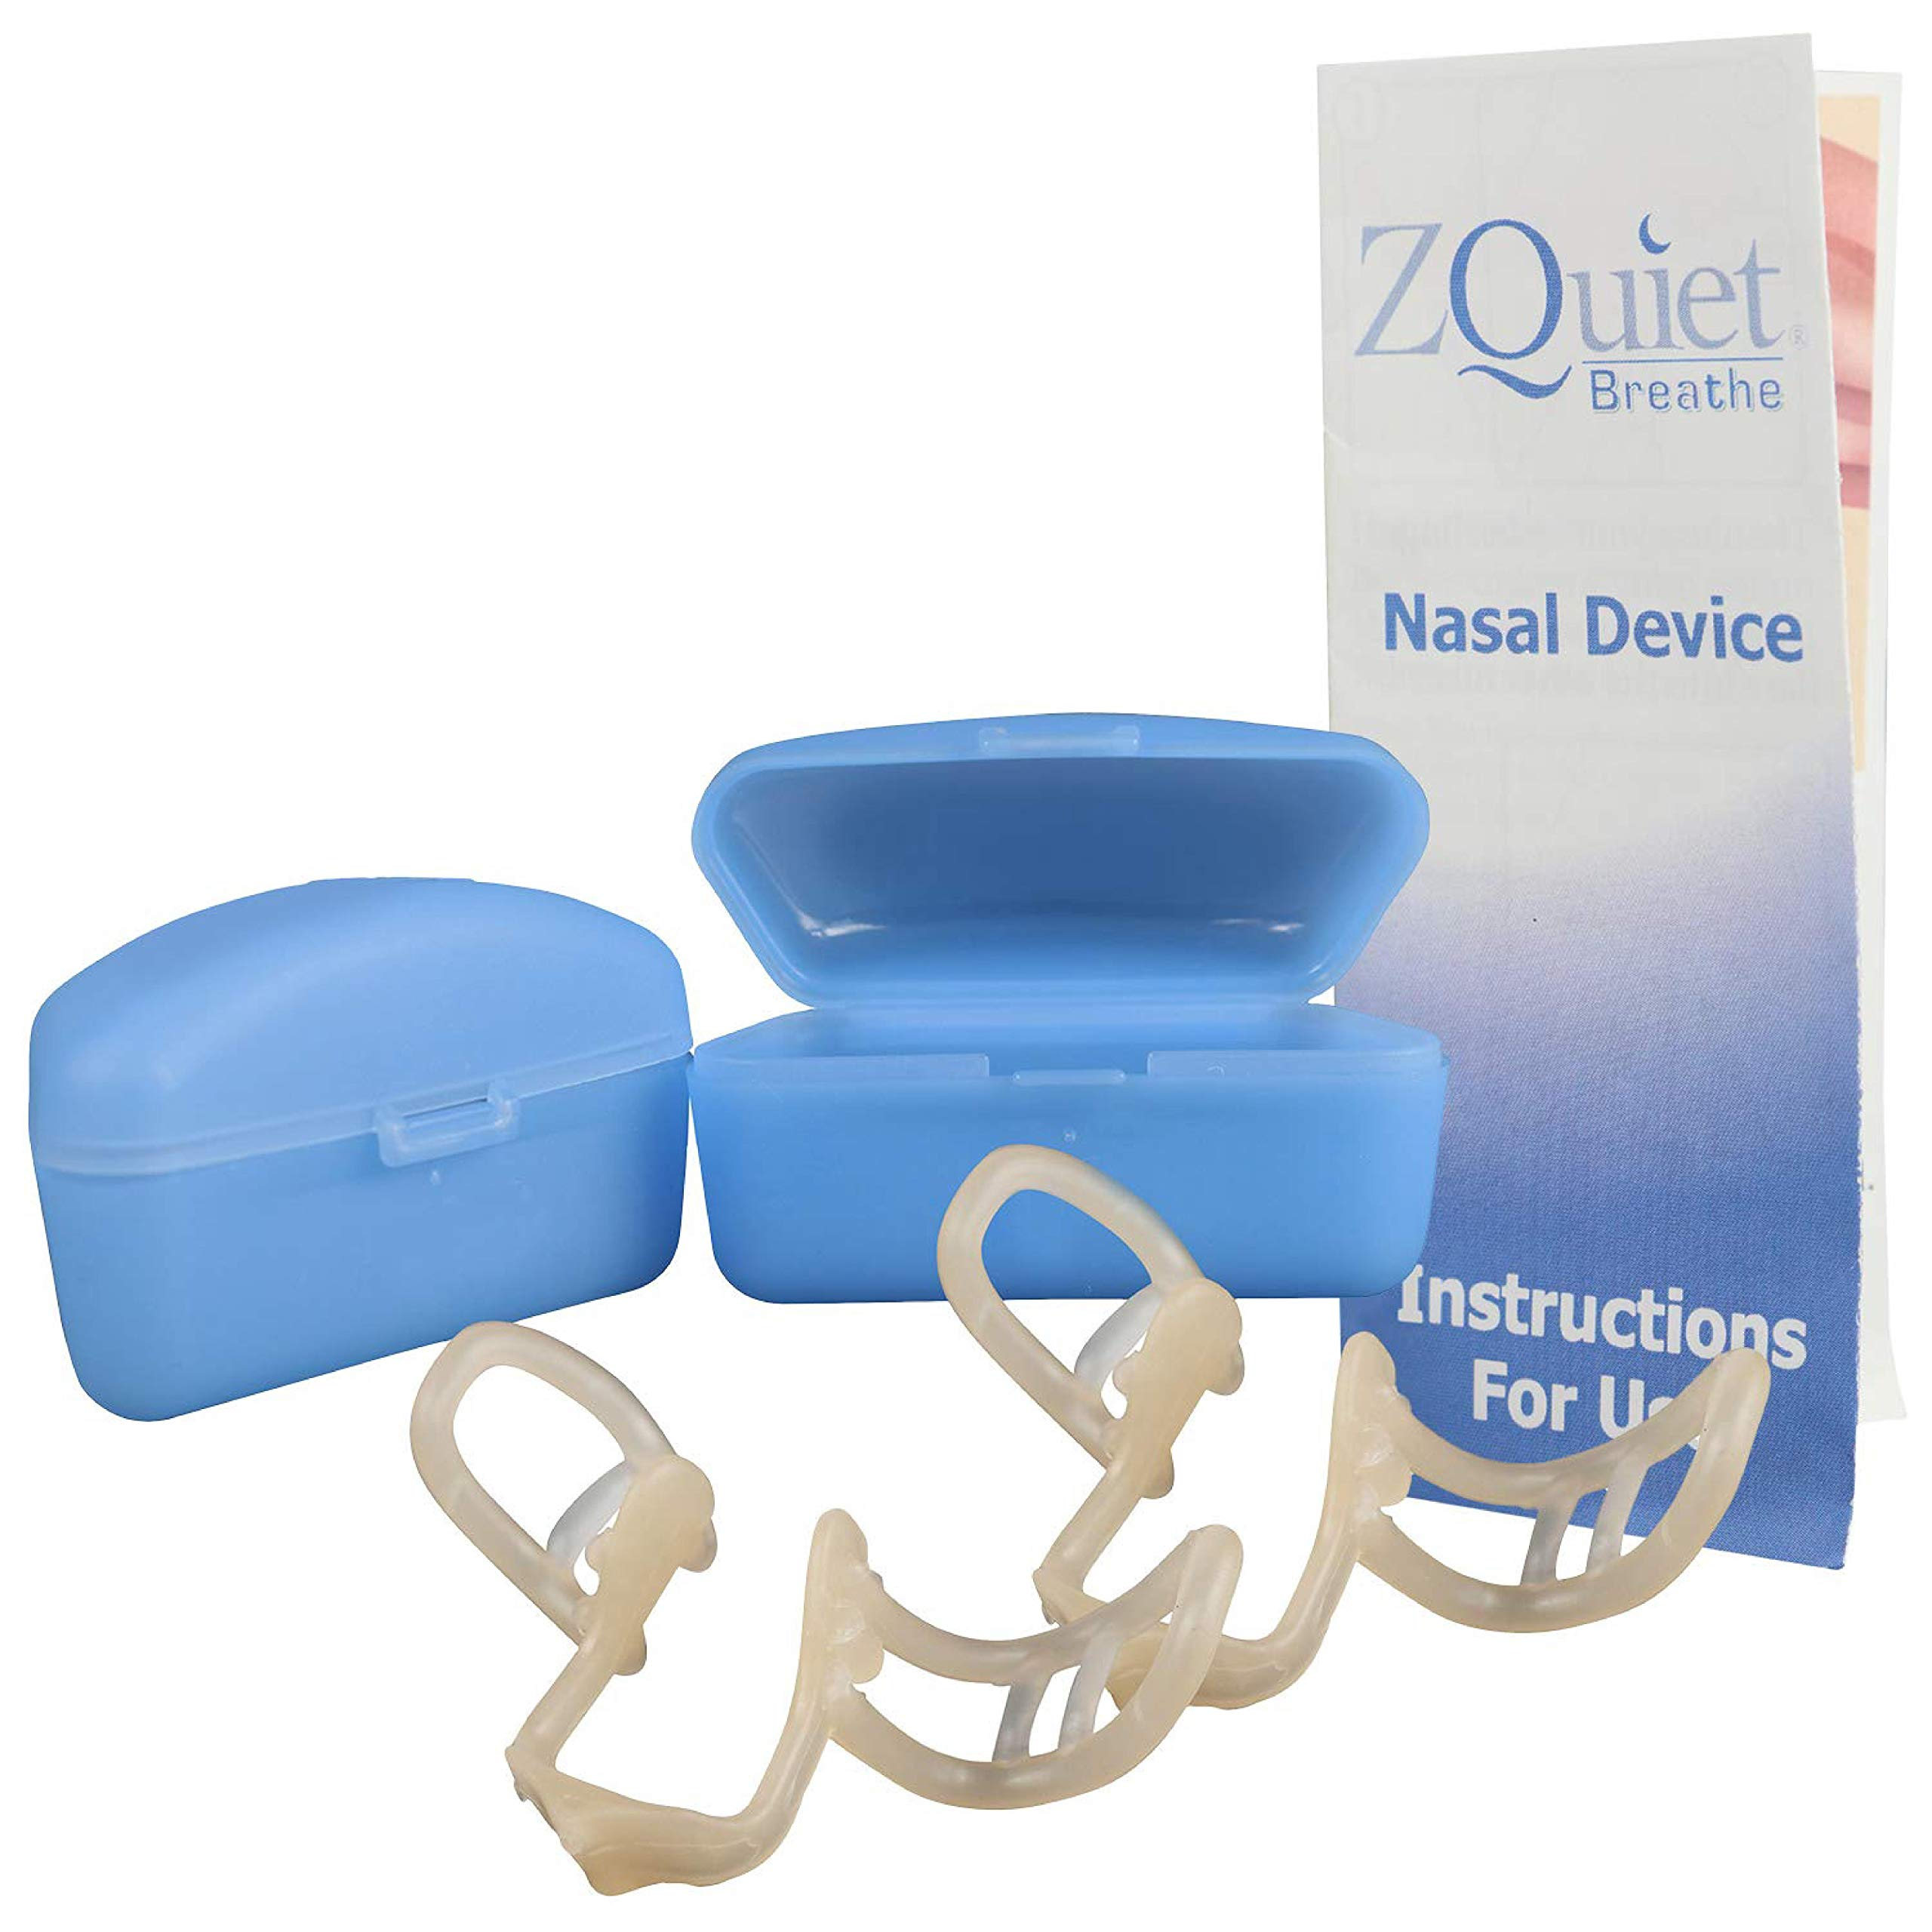 ZQuiet® Anti-Snoring Nasal Dilator with Case, 2ct. by ZQuiet